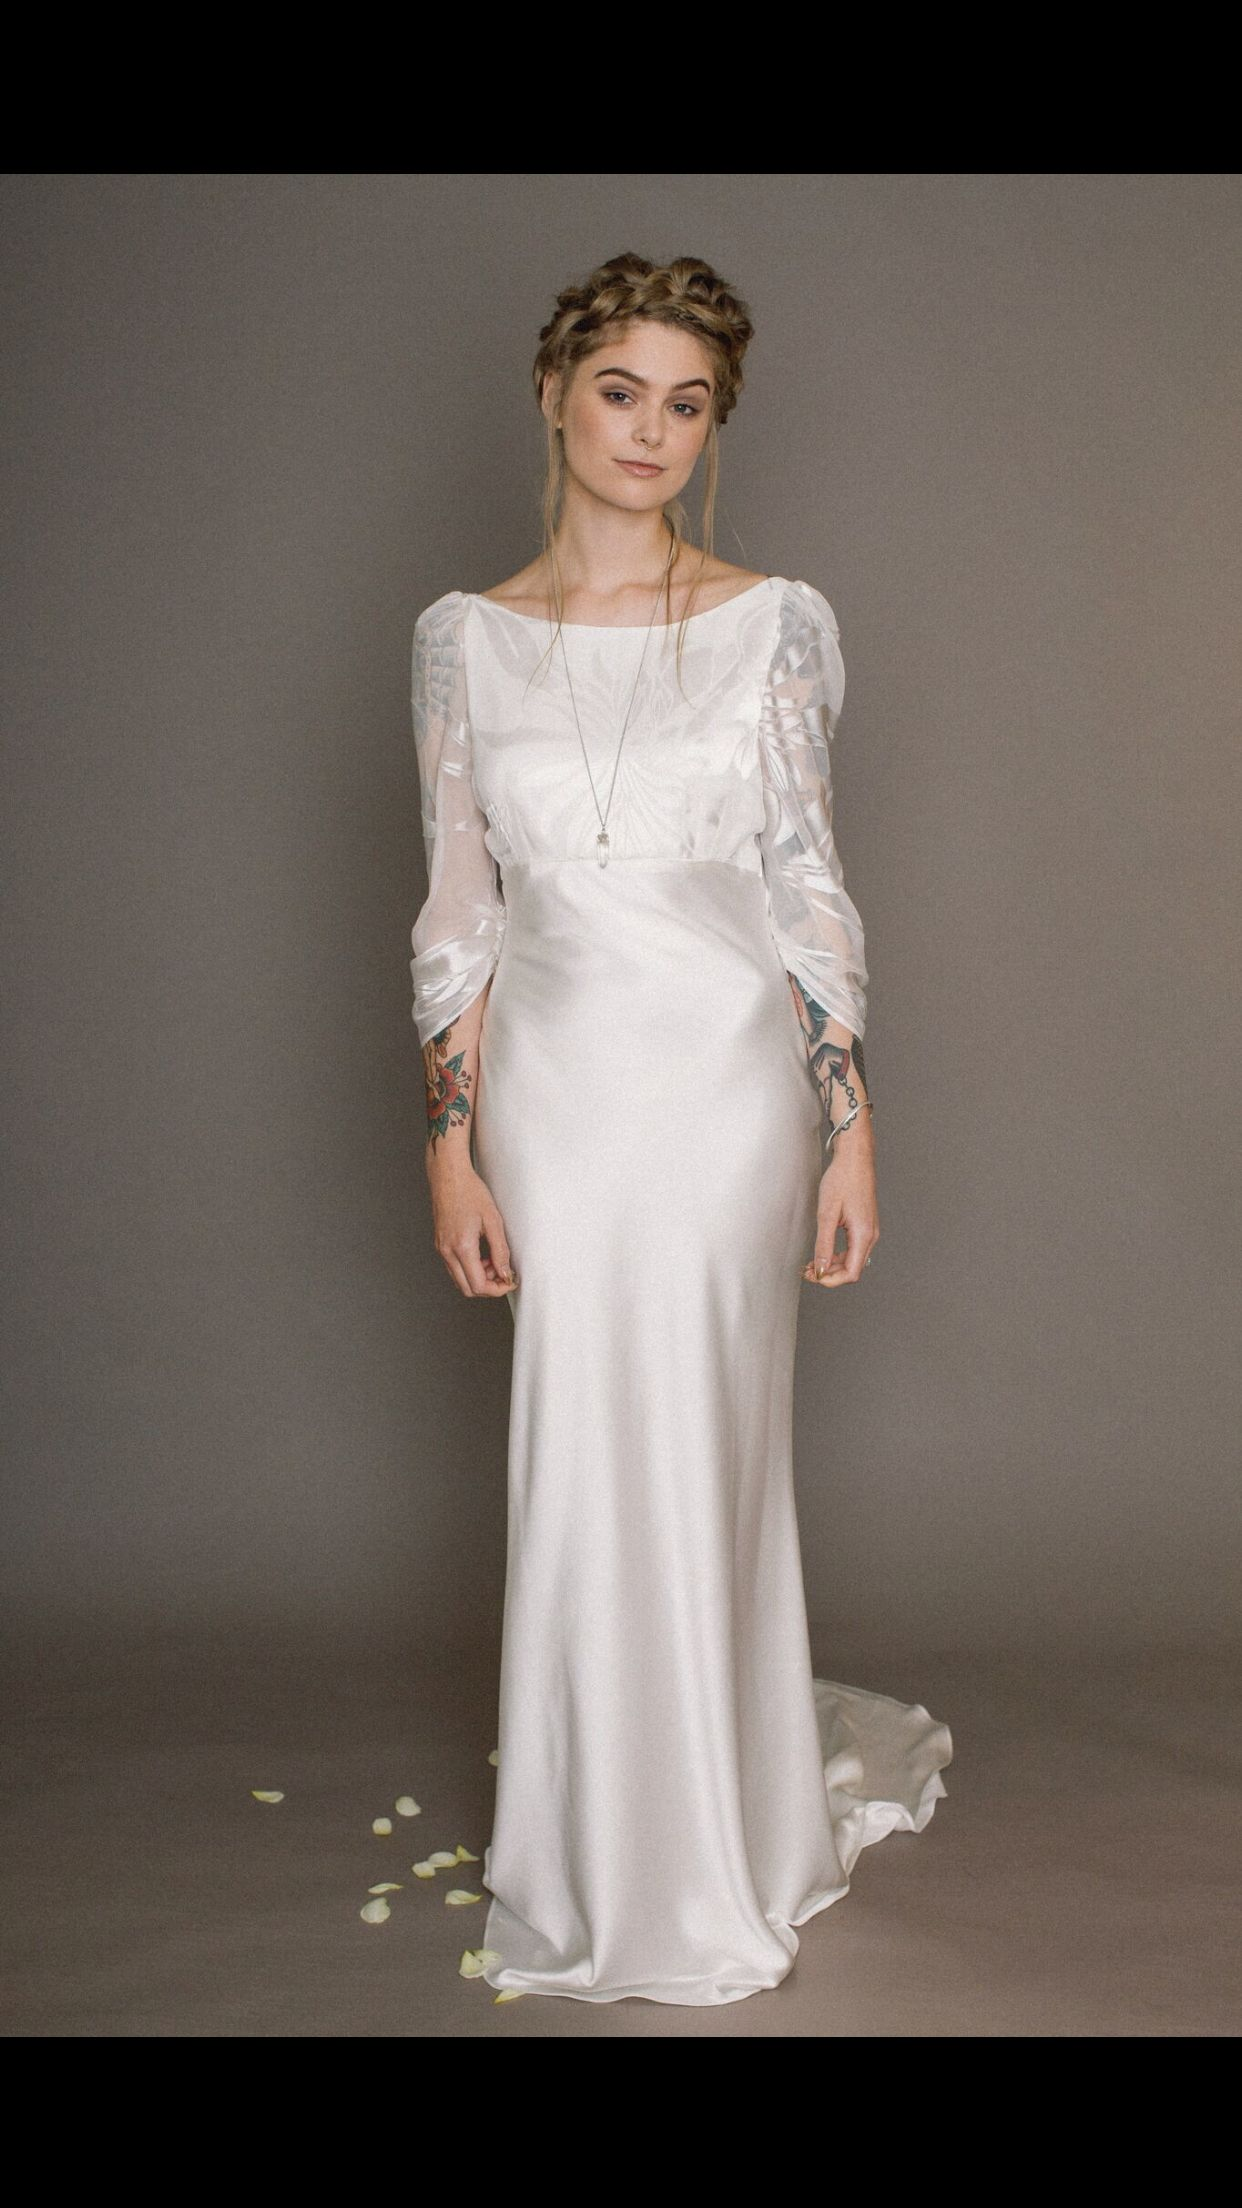 31736e6faa7e Silk wedding dress   Want in 2019   Wedding dresses, Tailored ...